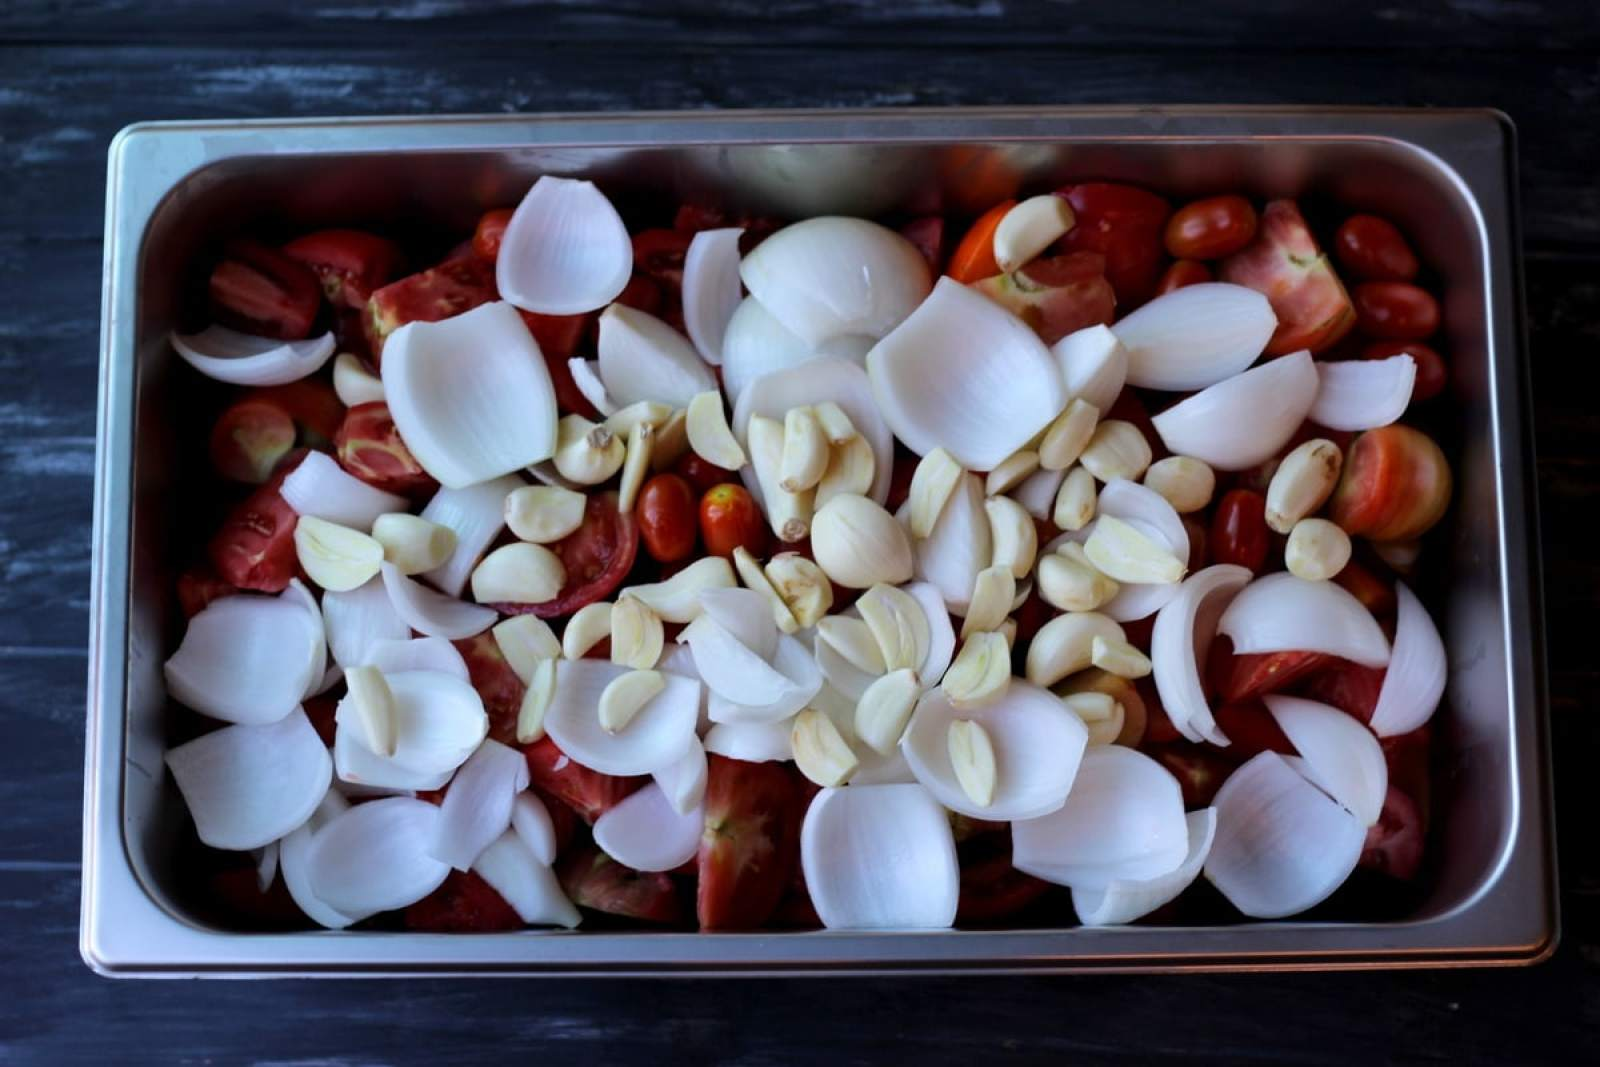 Making Homemade Spaghetti Sauce thewoodenskillet.com